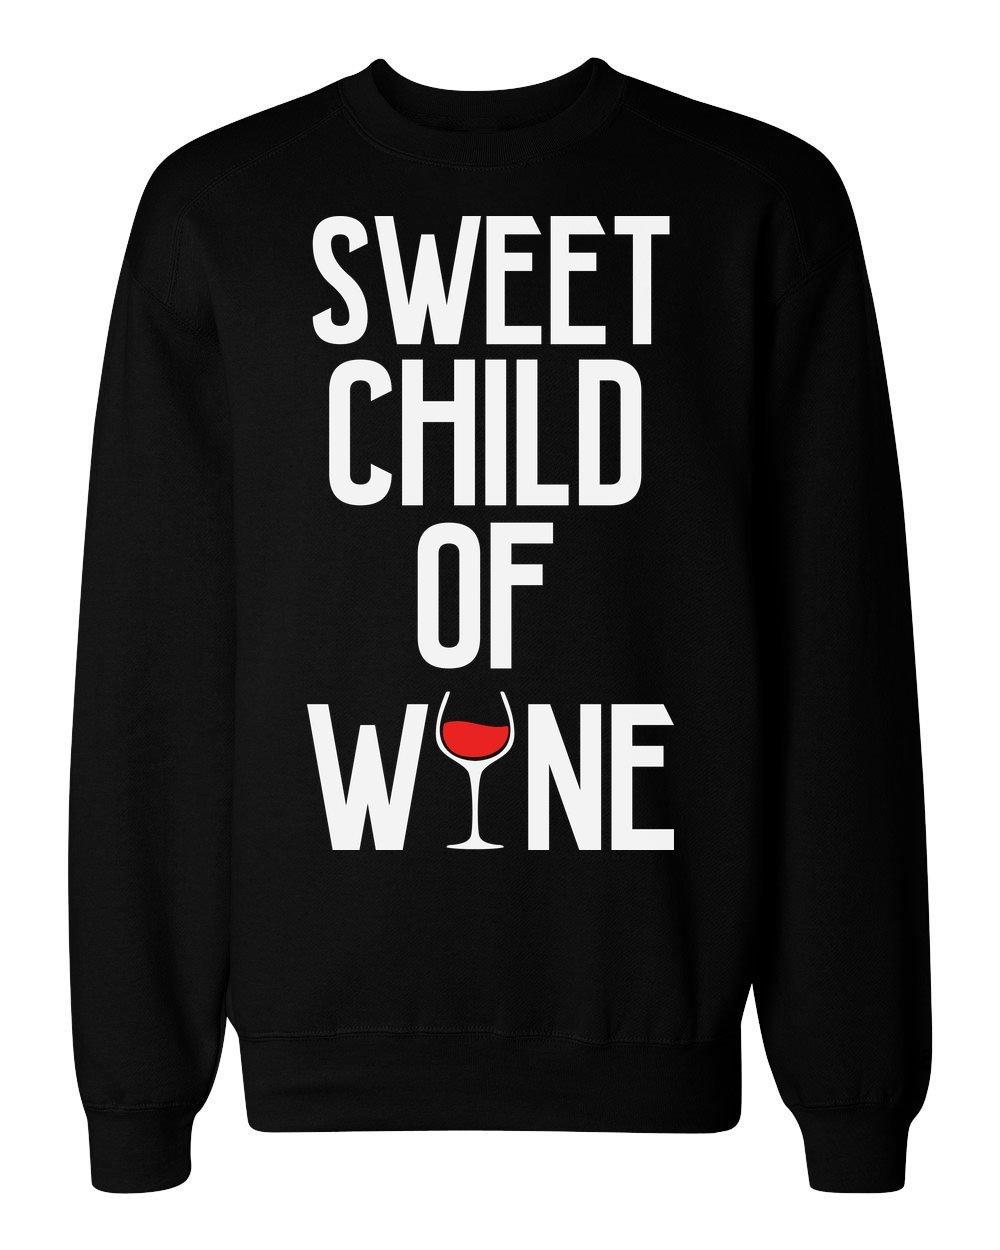 idcommerce Sweet Child of Wine Nice Glass of Red Wine Men's Women's Unisex Sweatshirt Extra Large